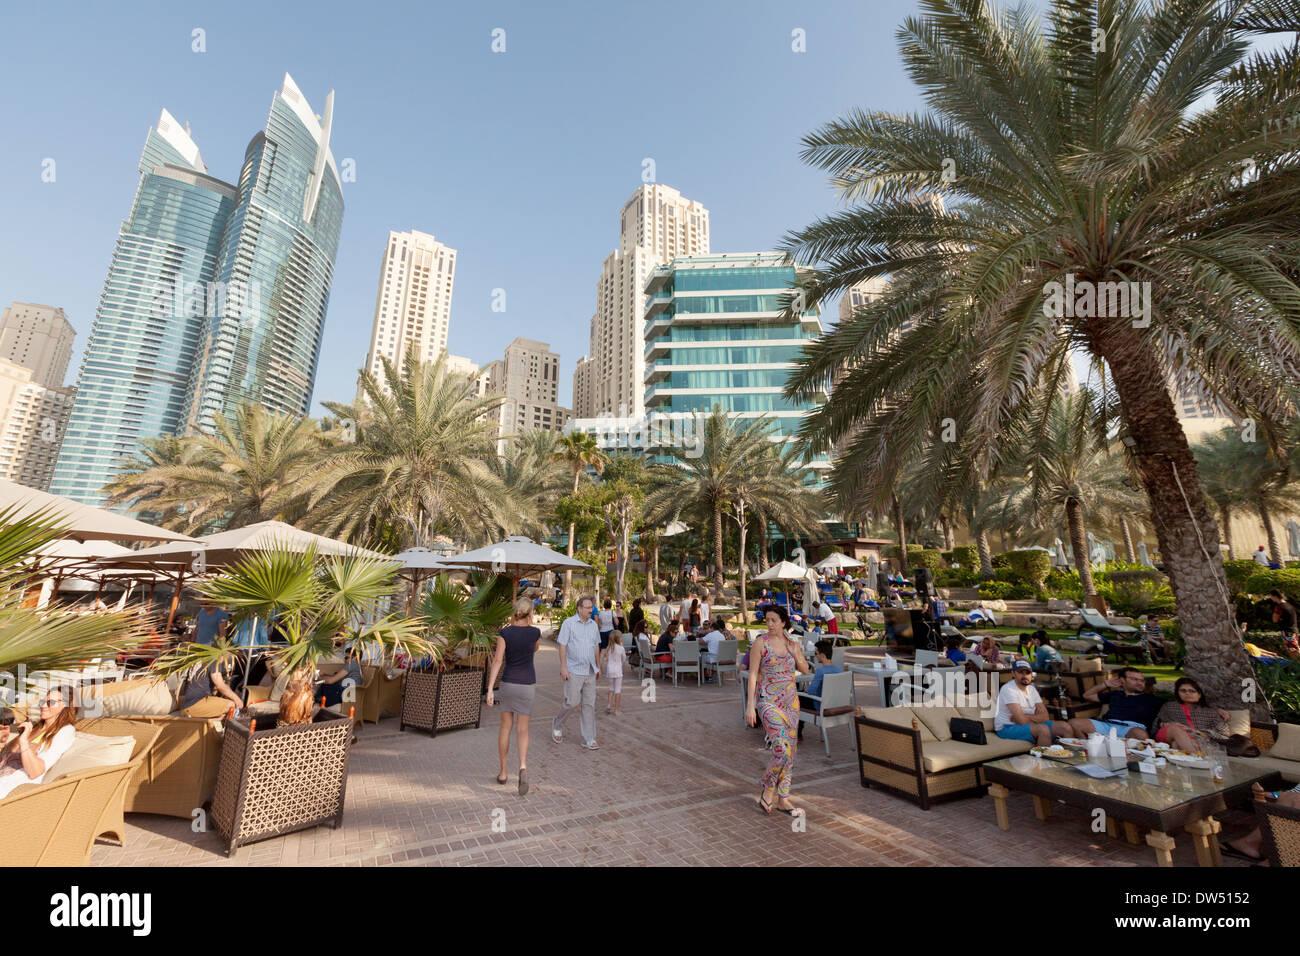 The hilton hotel a 5 star luxury hotel in jumeirah beach for Luxury hotels in dubai 7 star